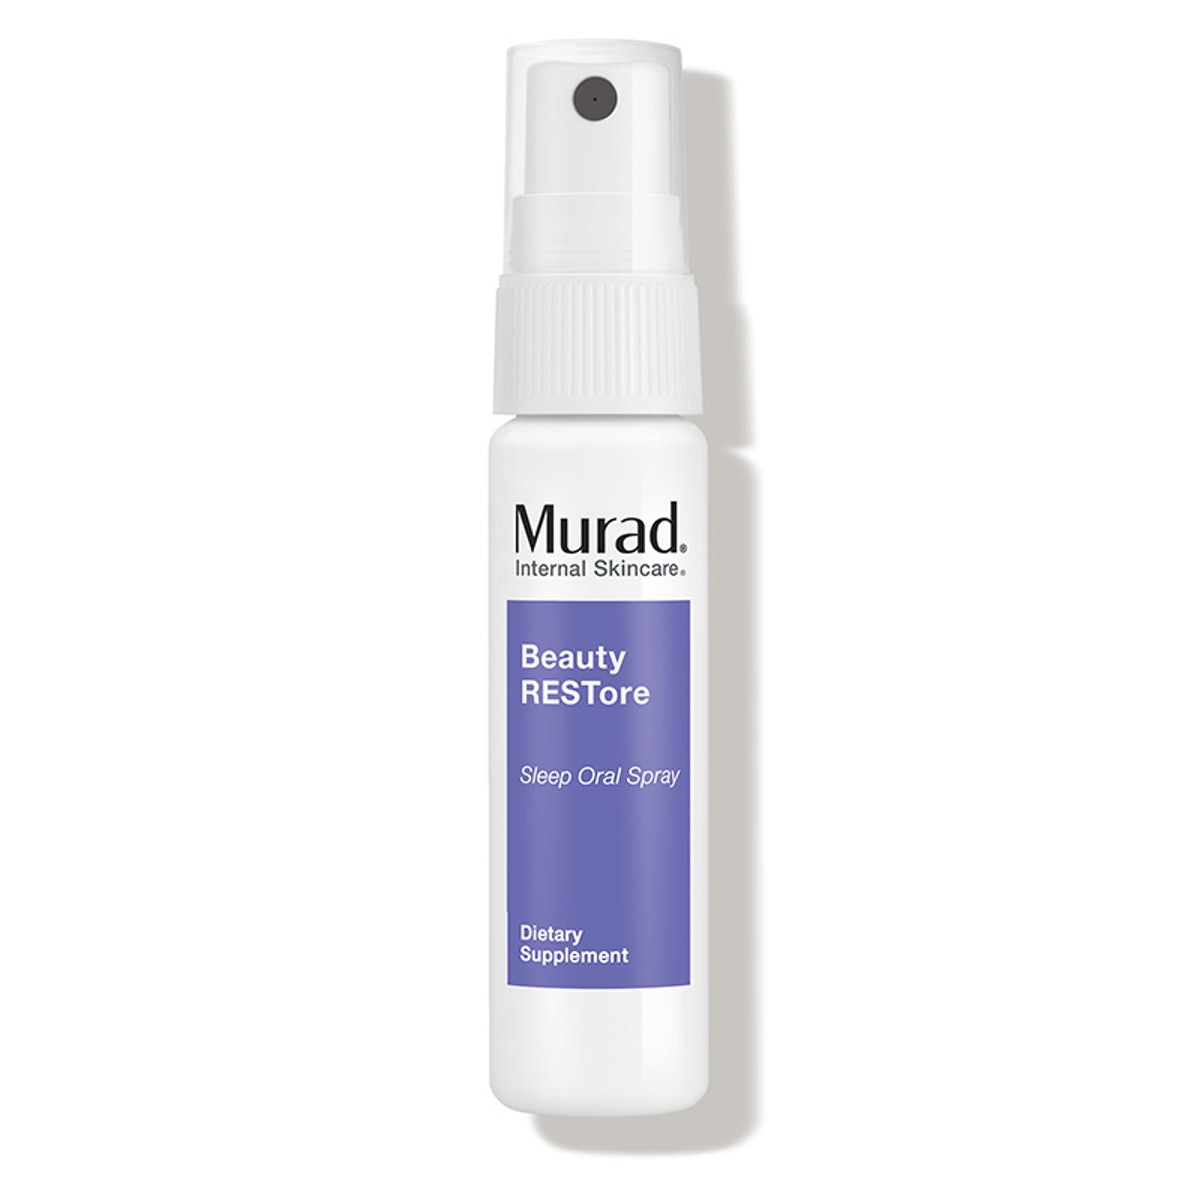 Beauty RESTore Sleep Oral Spray